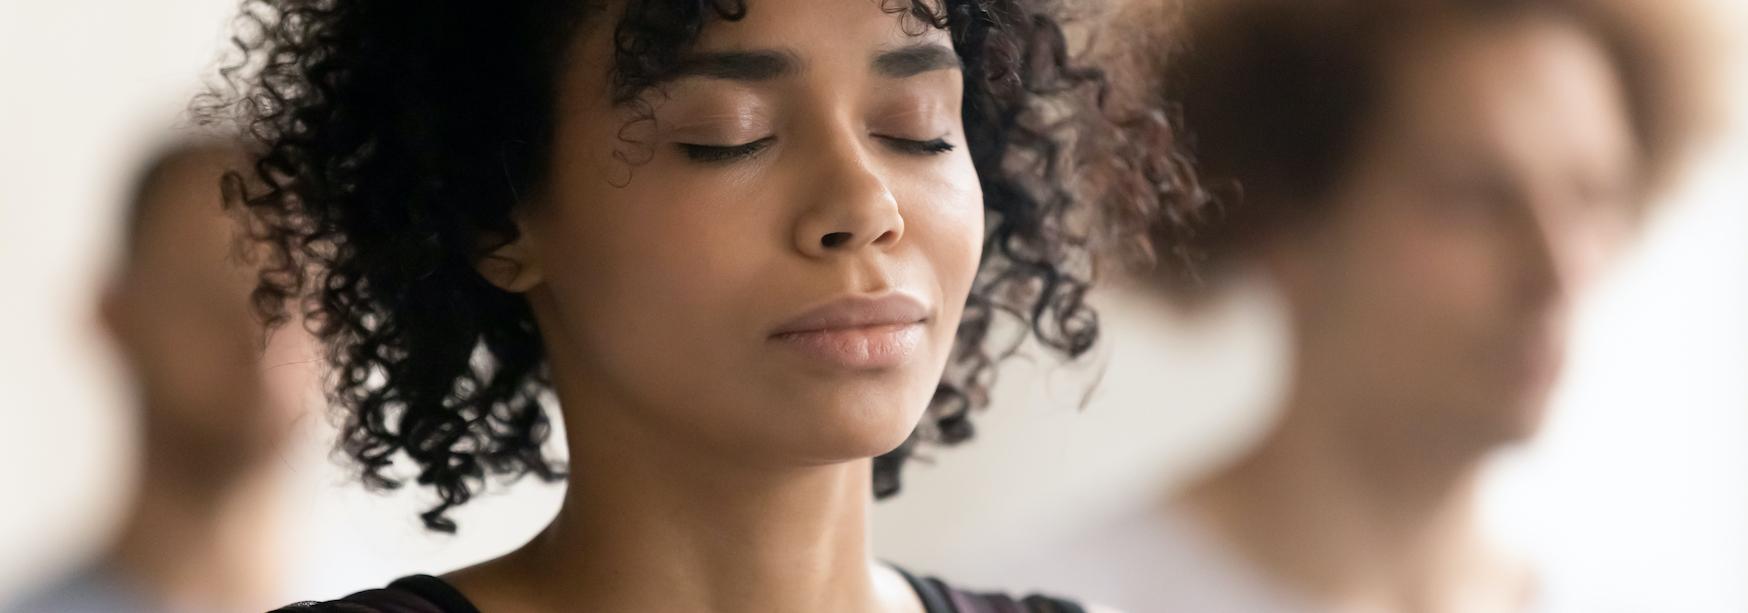 LP-Hero_1748x534-grey-young-female-mindfulness-realxed-meditation